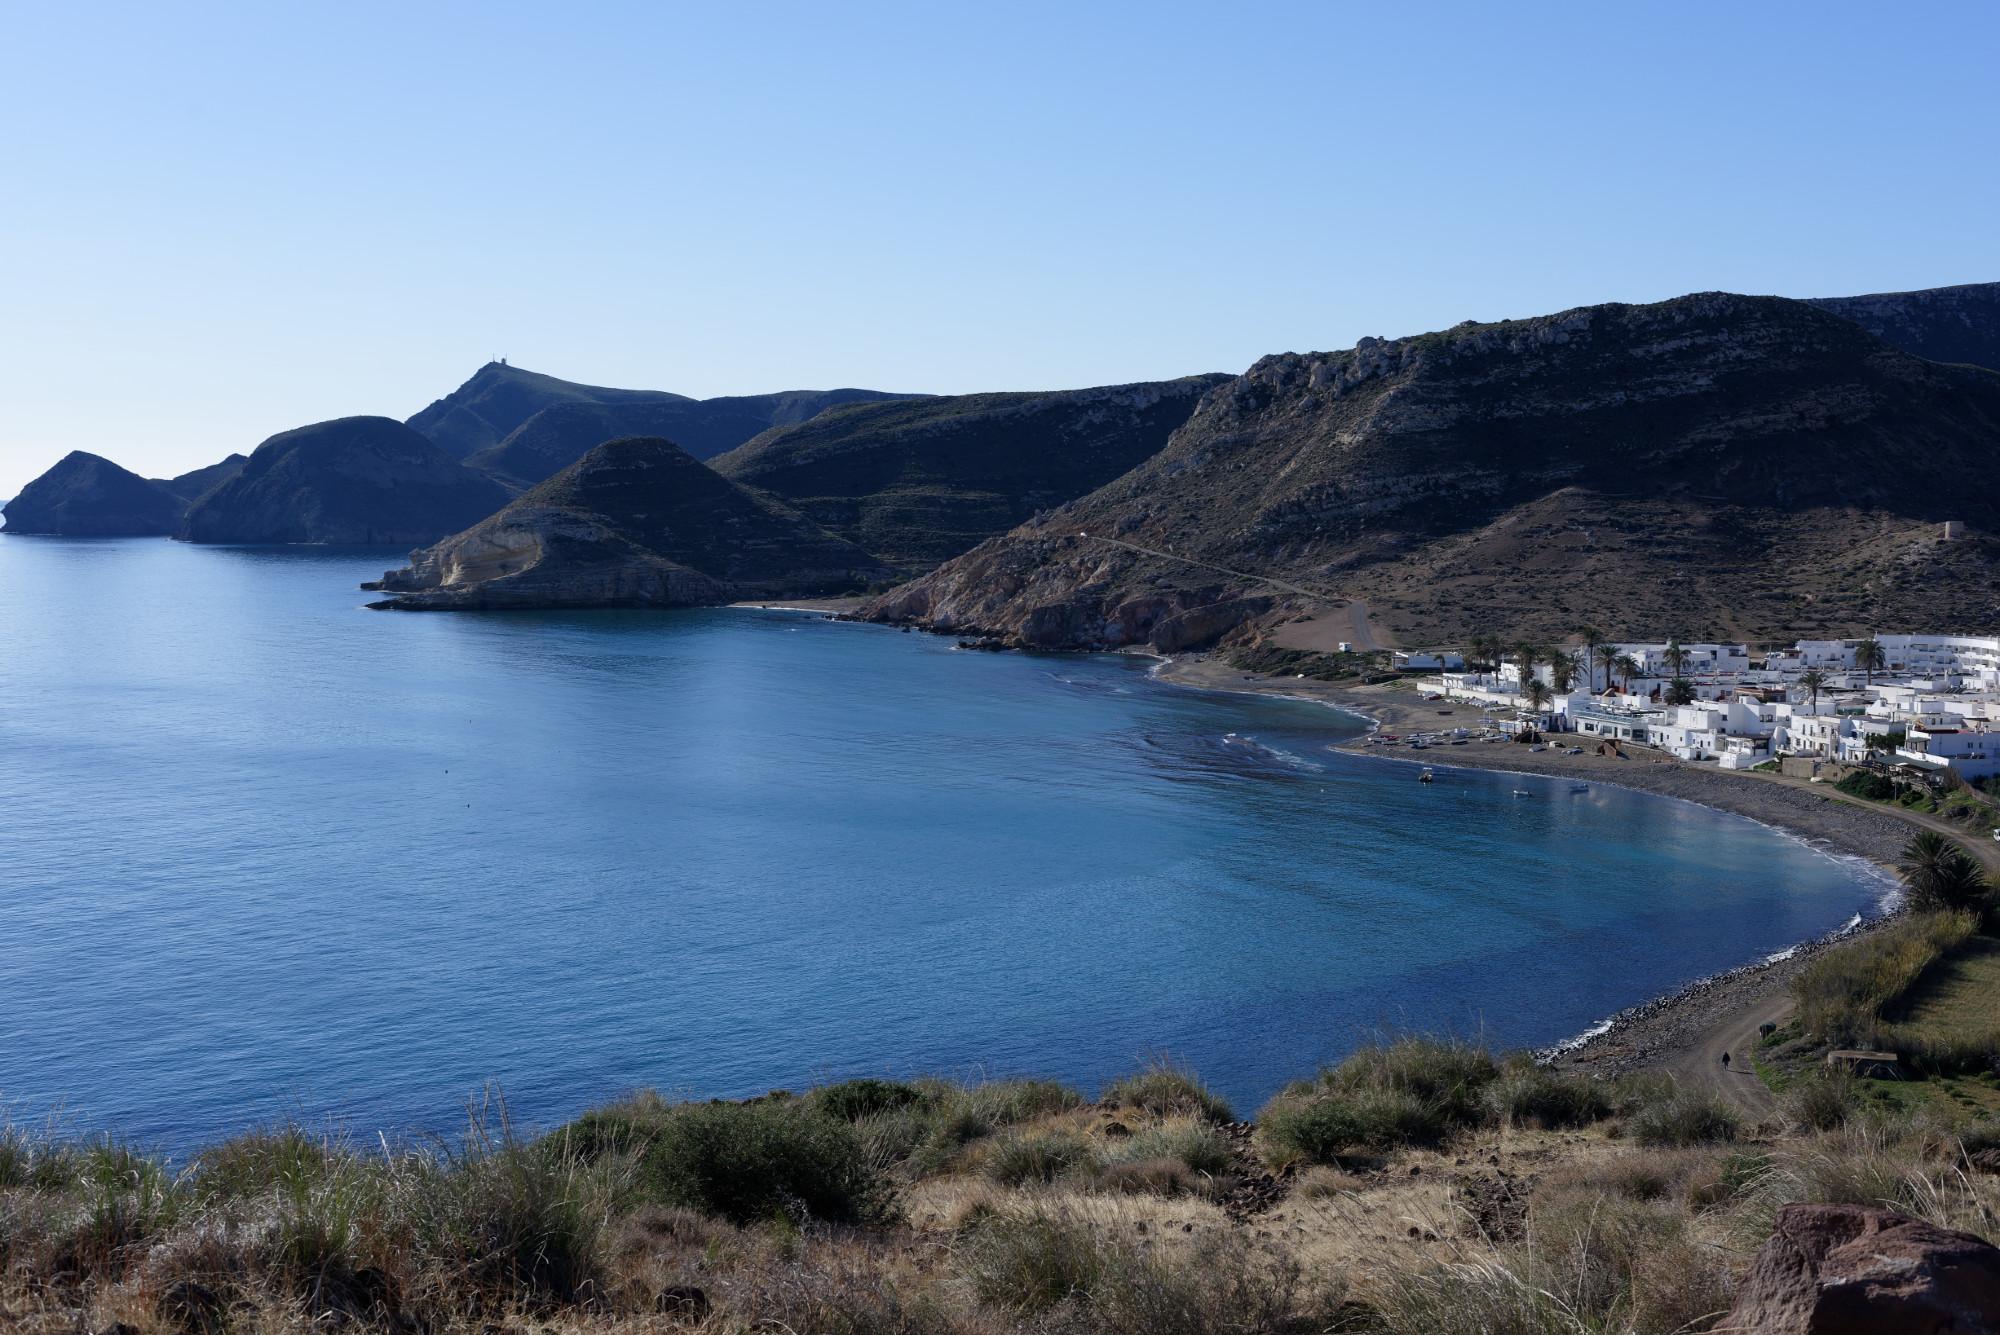 171213-Marche Las Negras-Cala San Pedro-Las Negras (14) (Cabo de Gata-Andalousie)